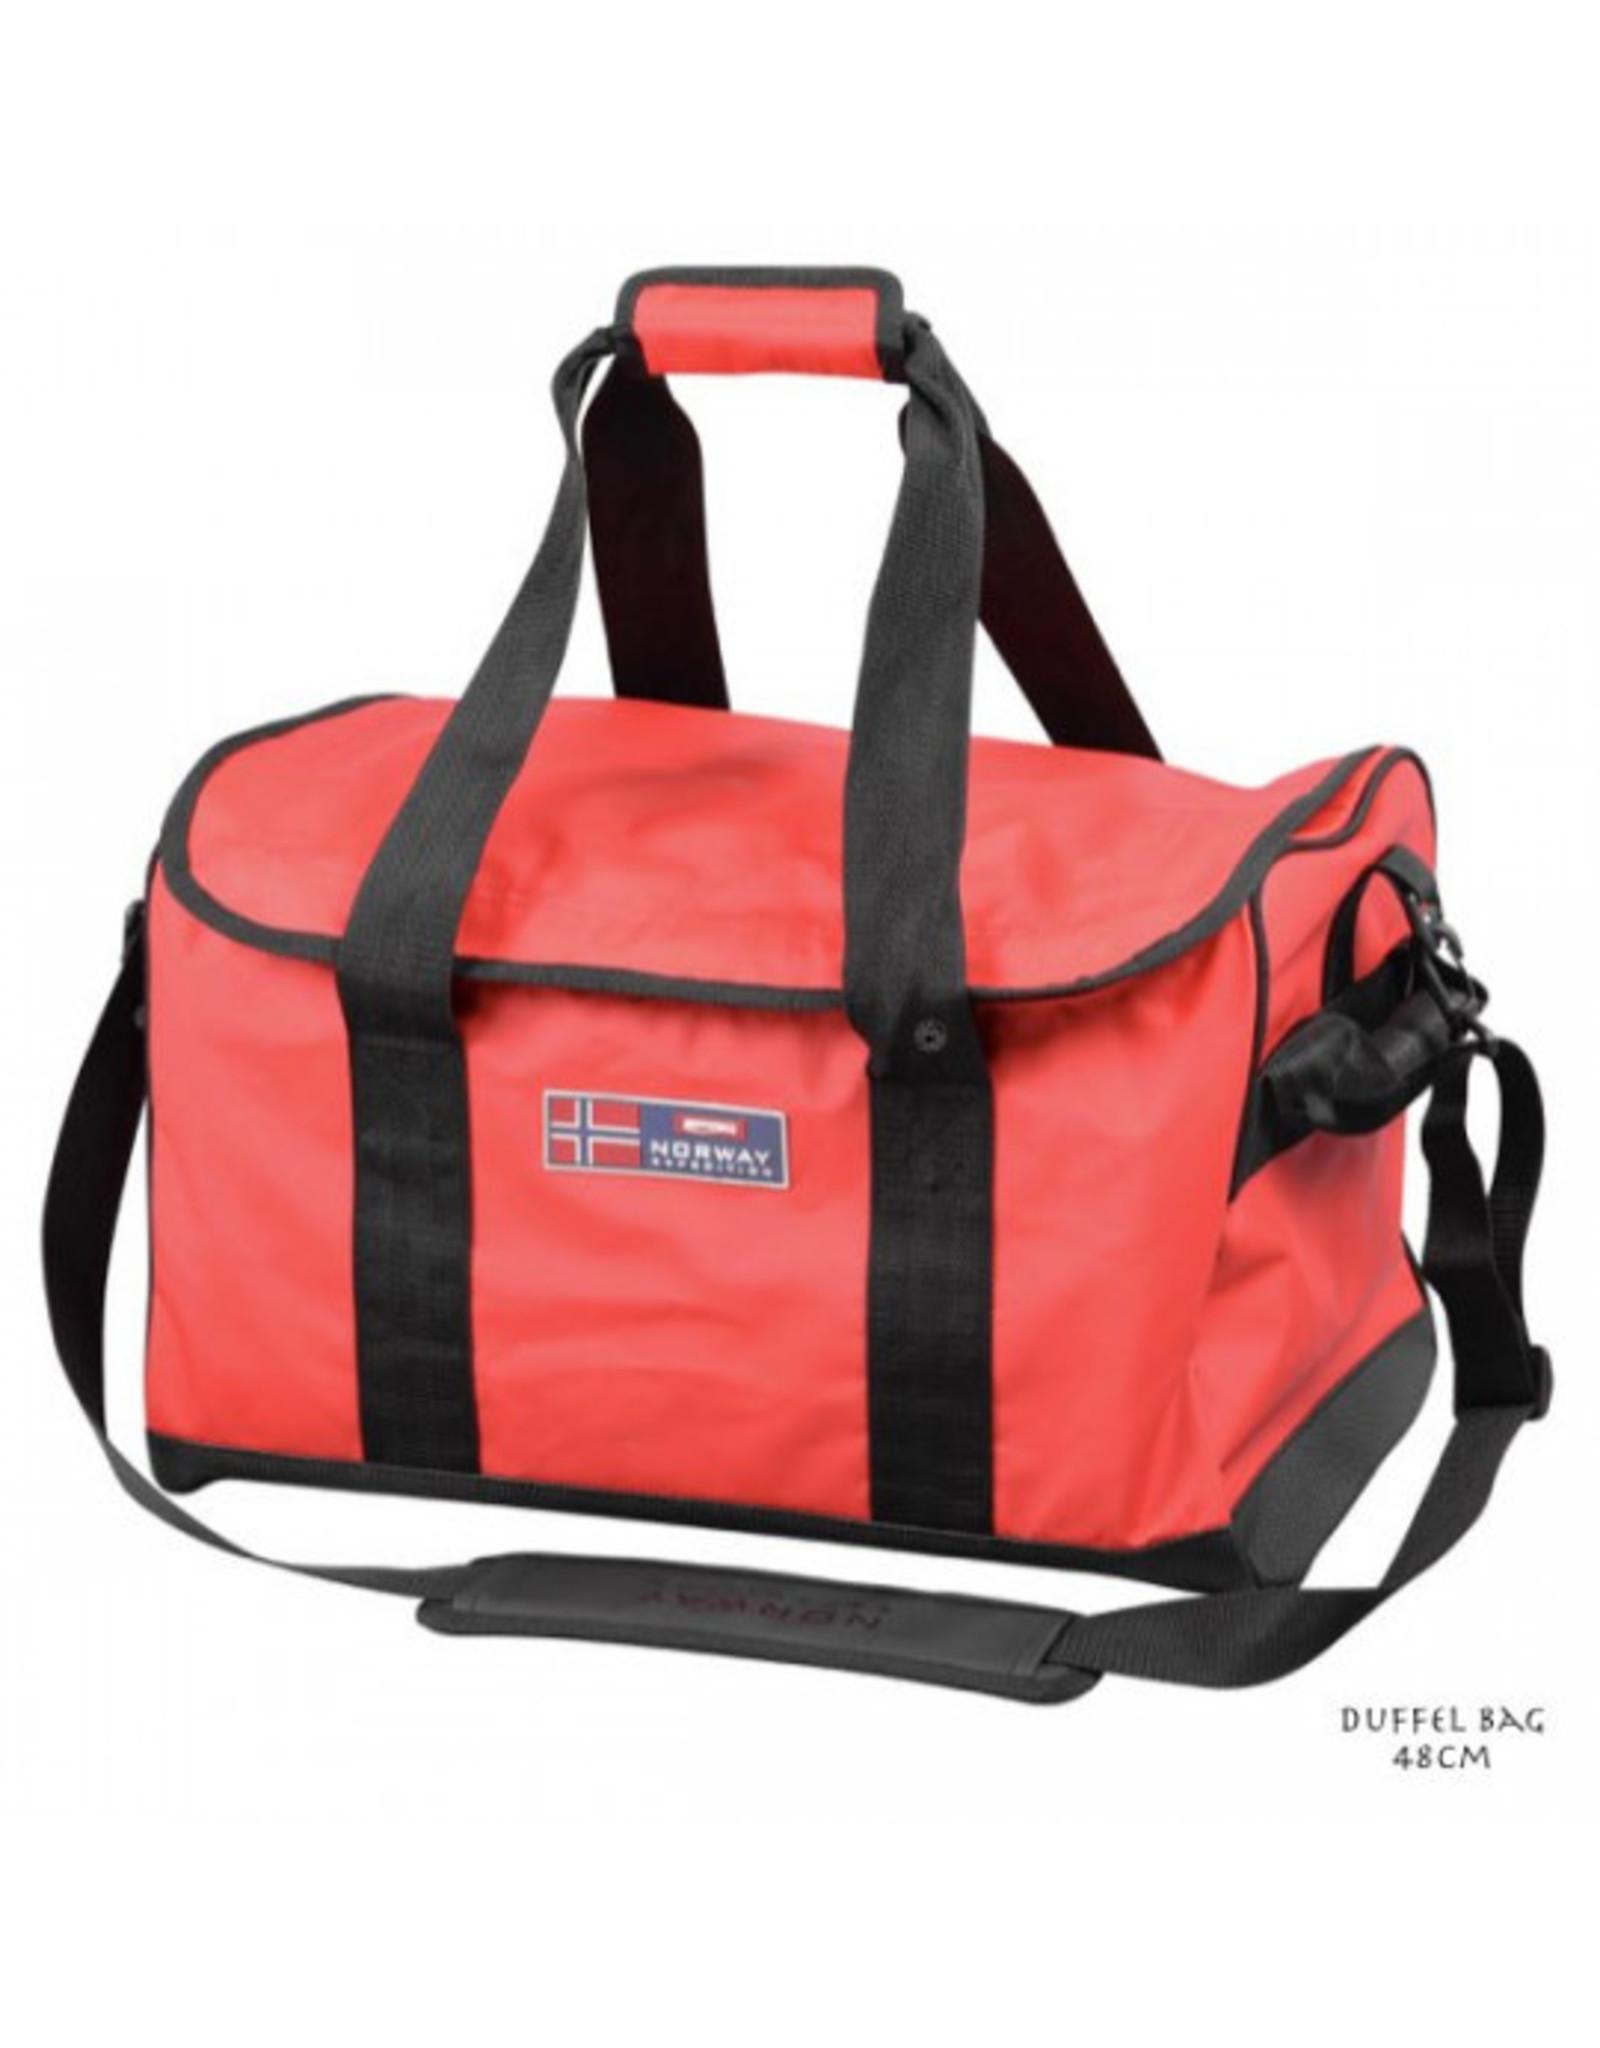 SPRO Spro Norway HD Duffel Bag